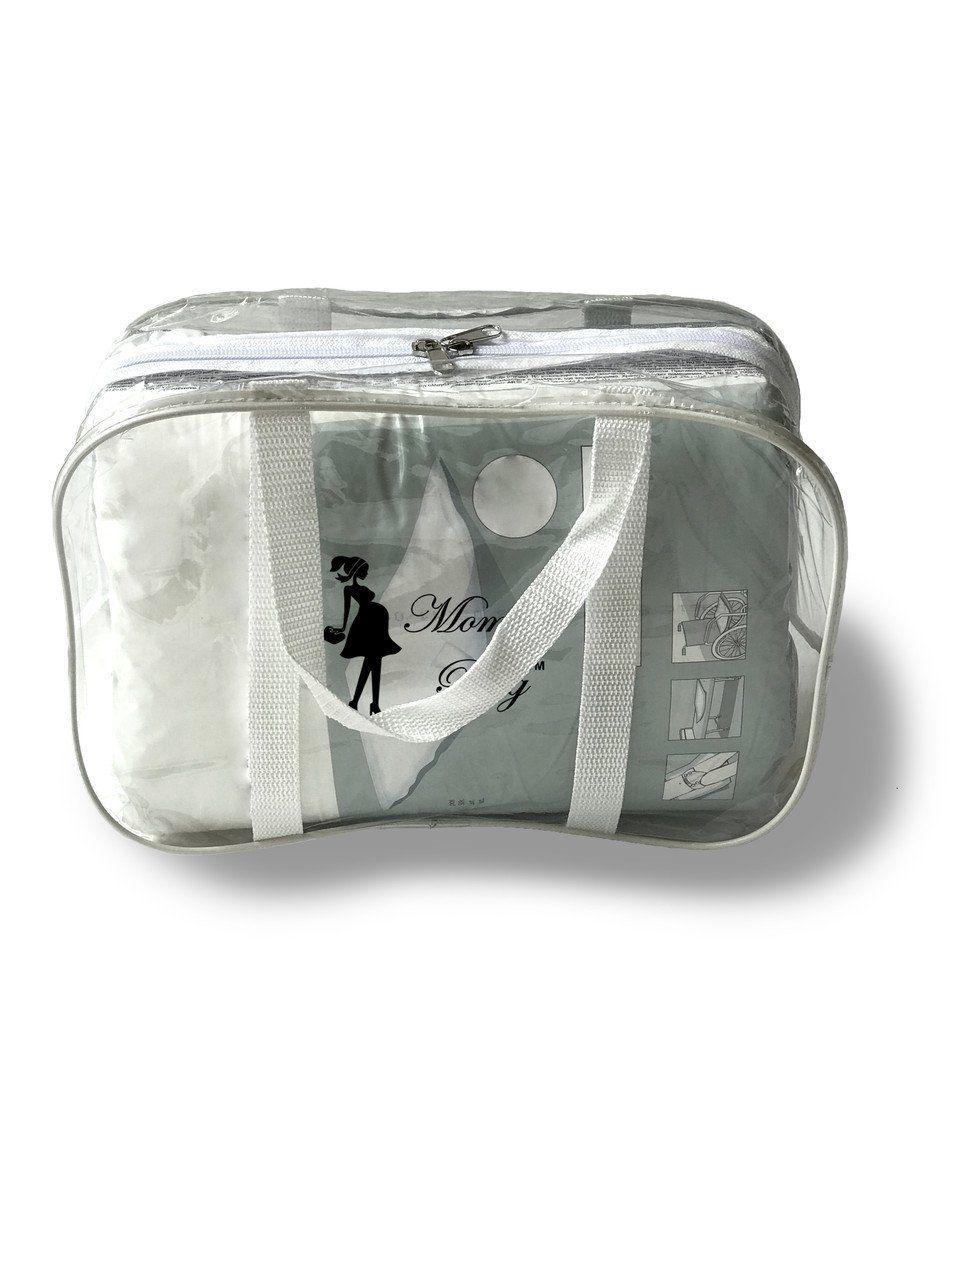 Сумка прозрачная в роддом Mommy Bag, размер - S, цвет - Белый